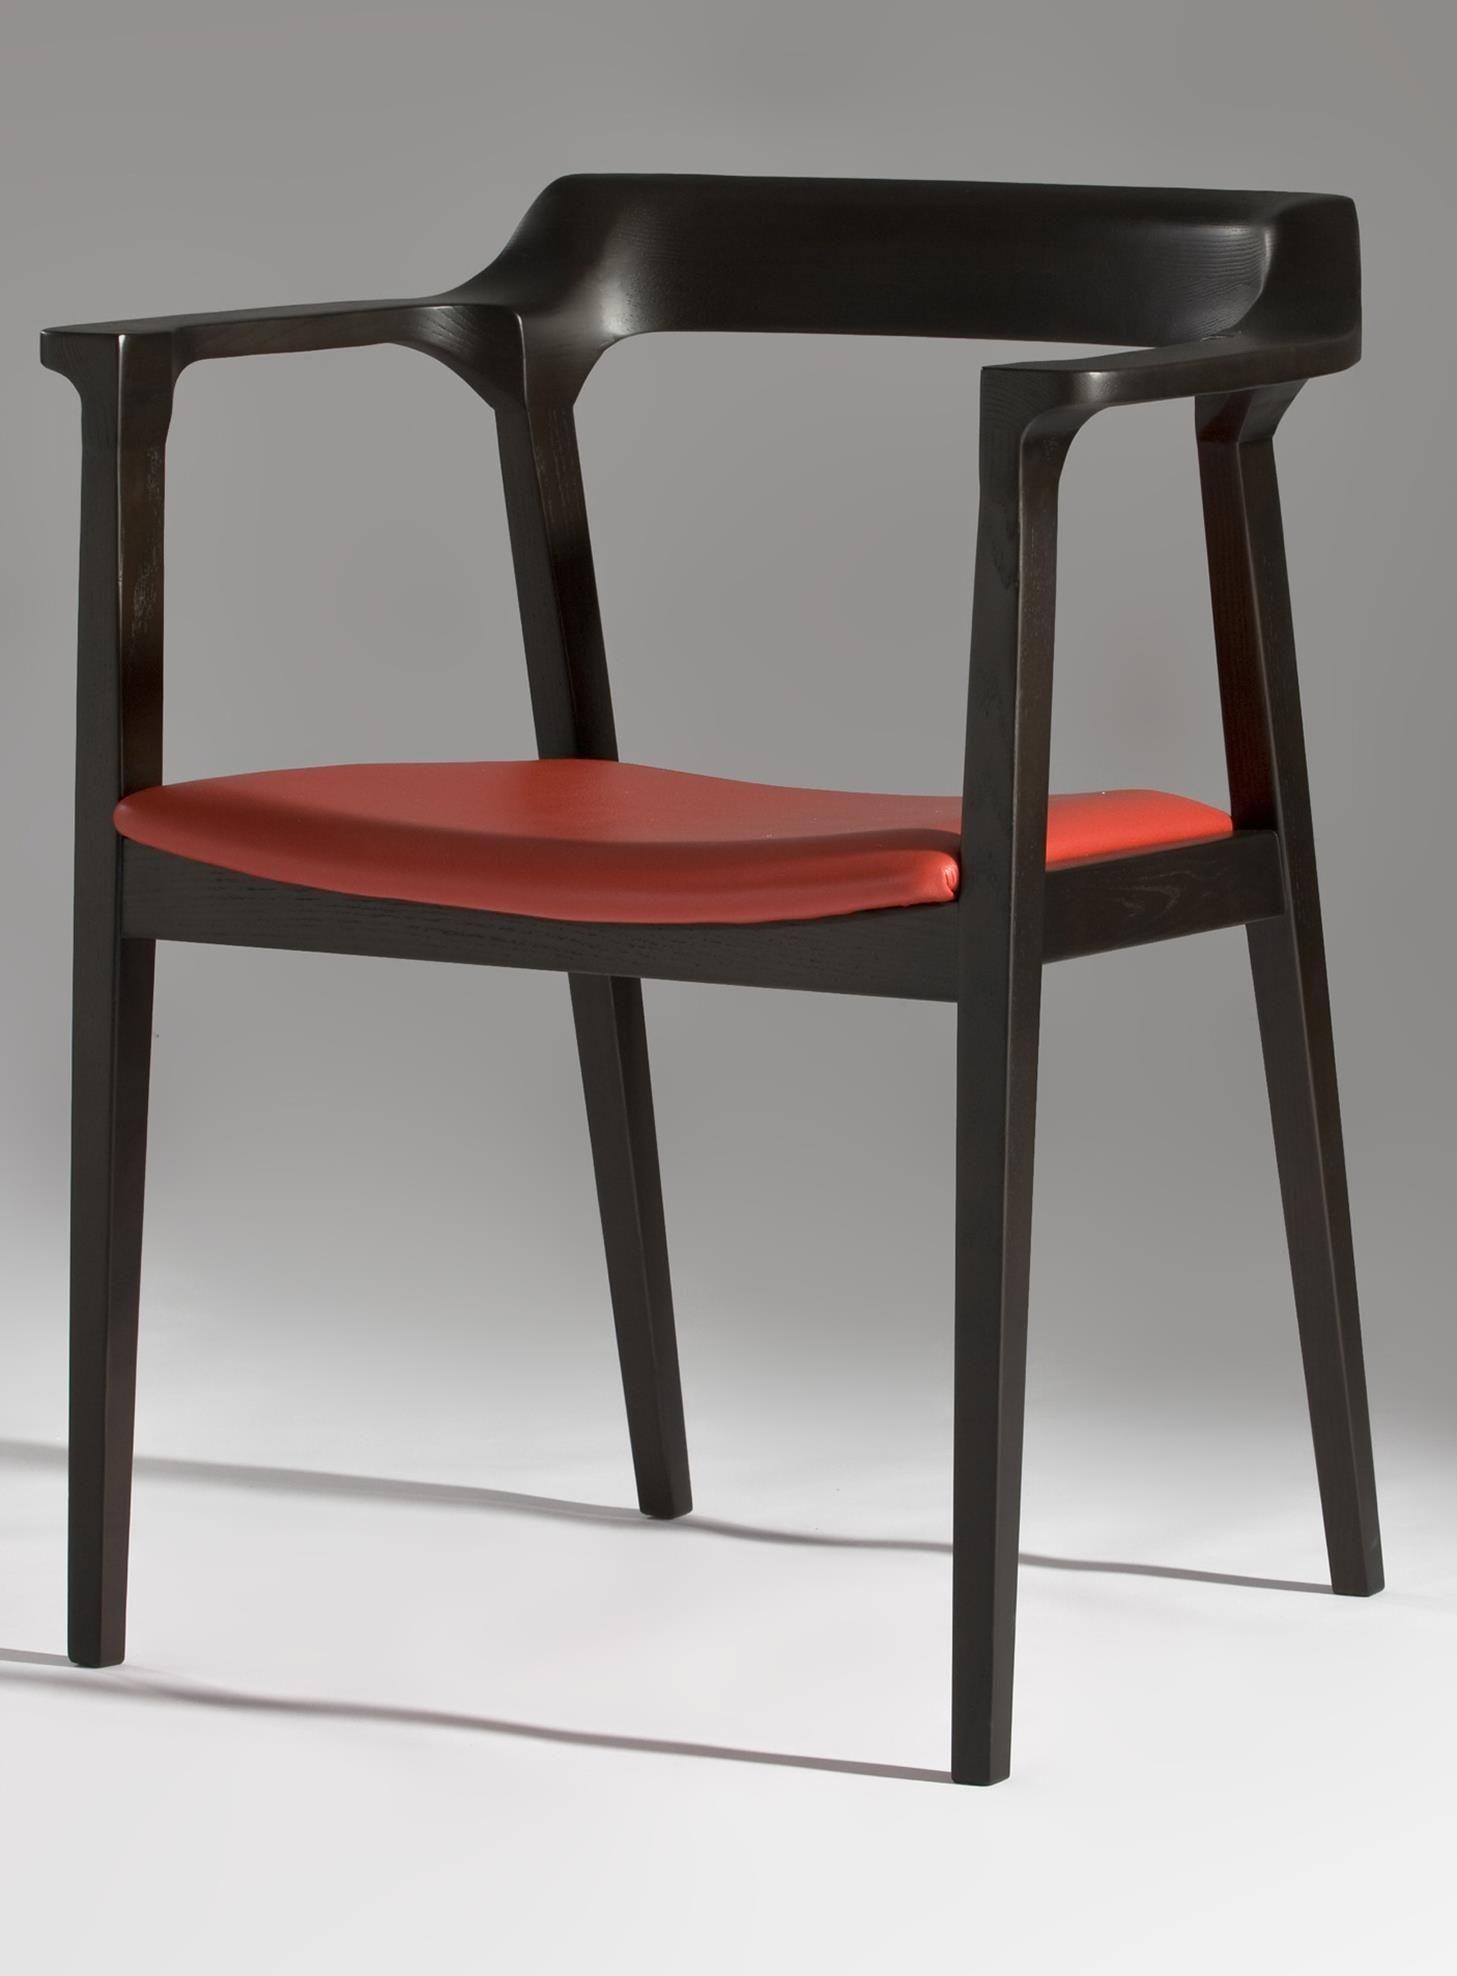 Design Form Furnishings: Layla Arm Chair | Vendors | Pinterest